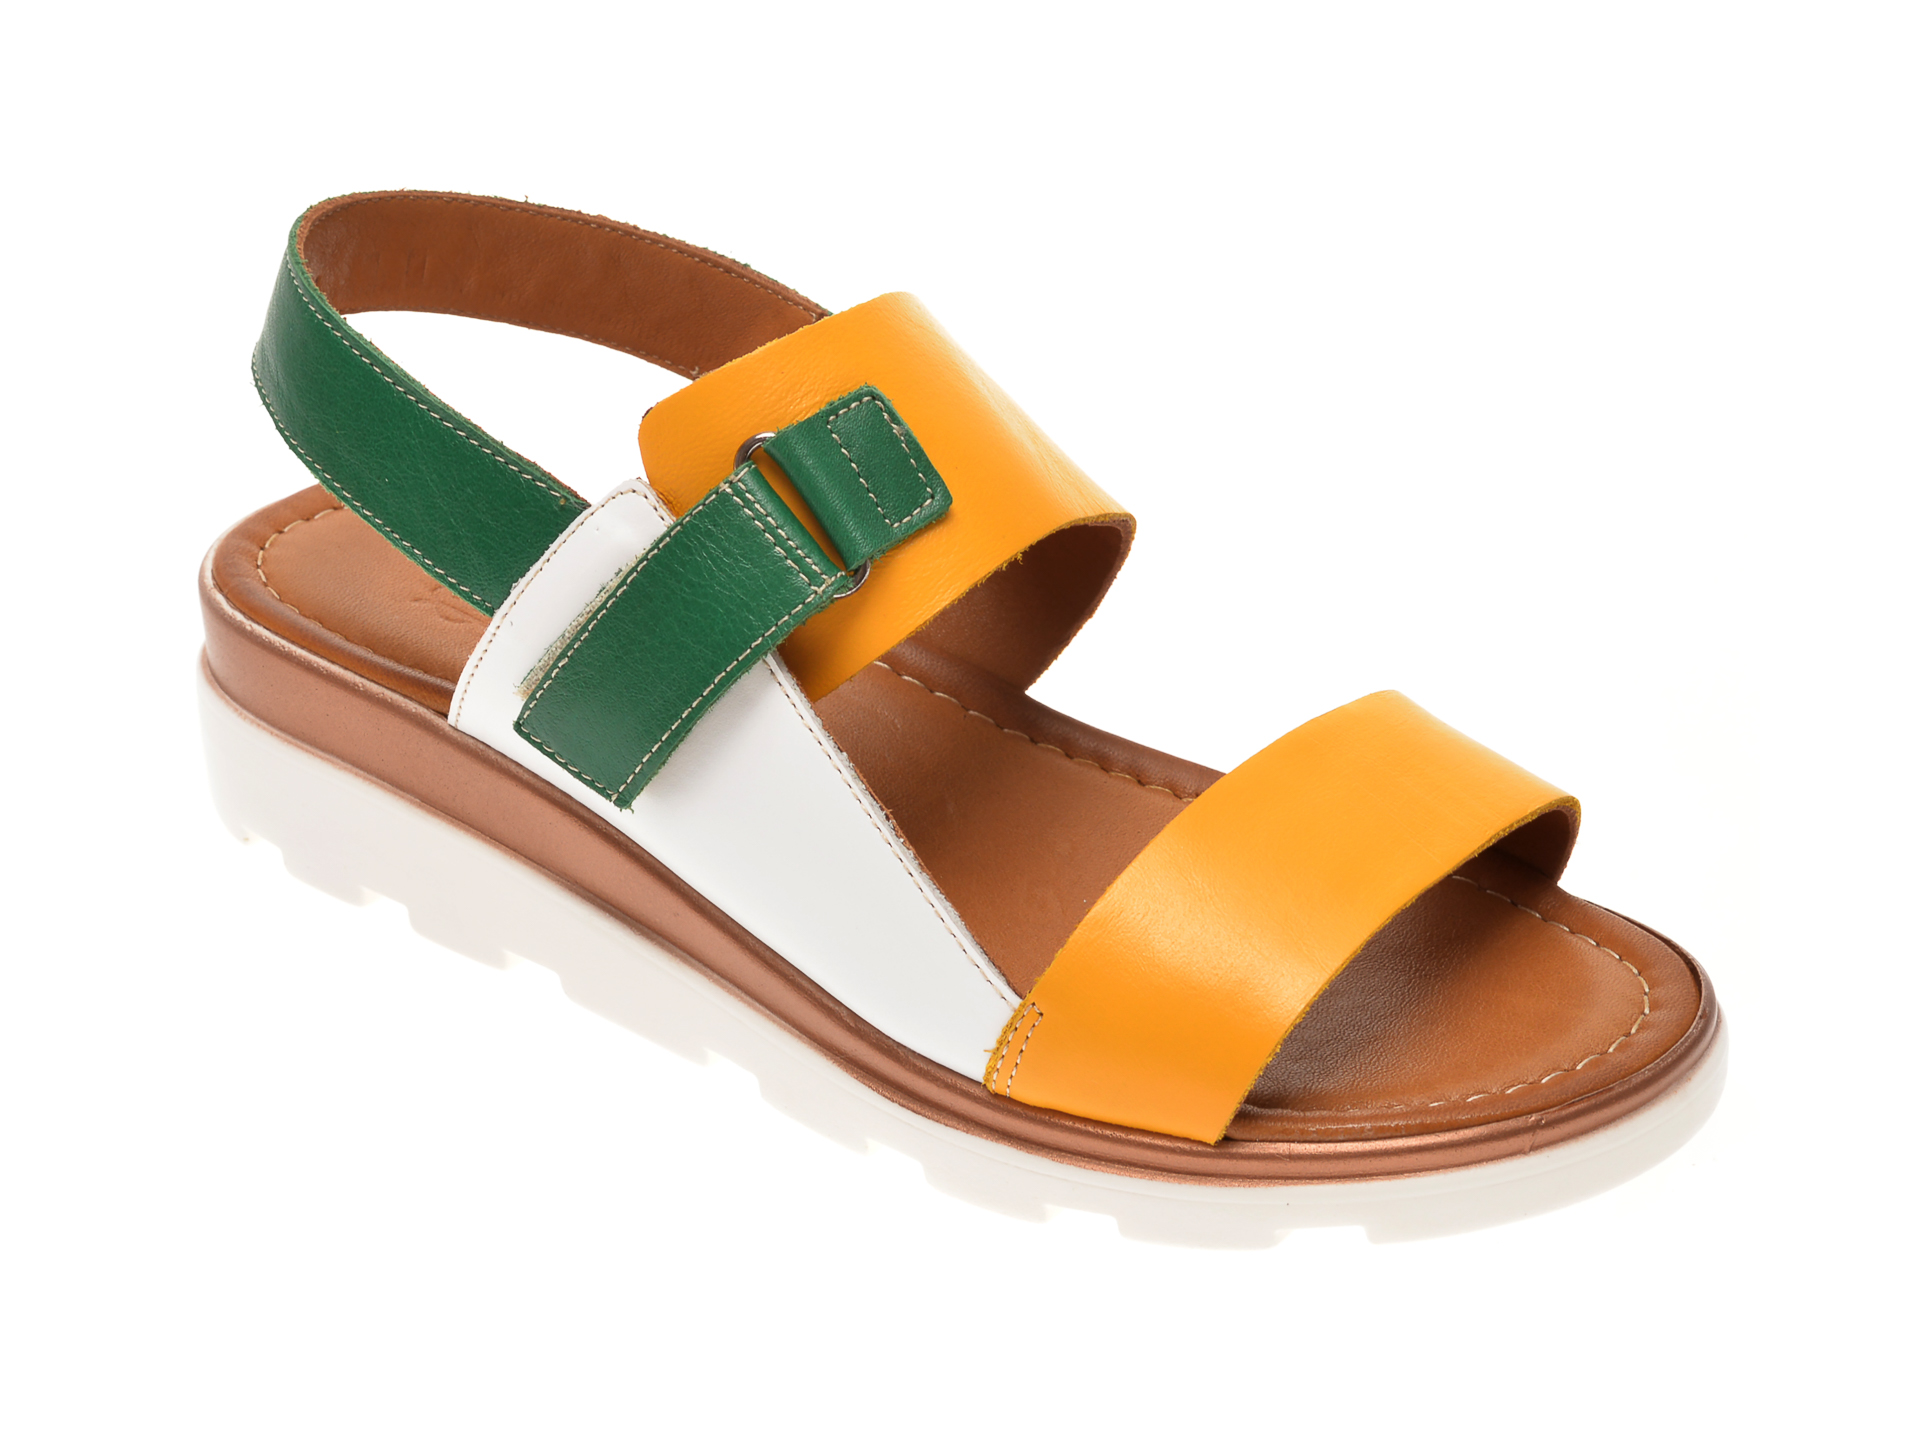 Sandale MISS LIZA galbene, 1182050, din piele naturala